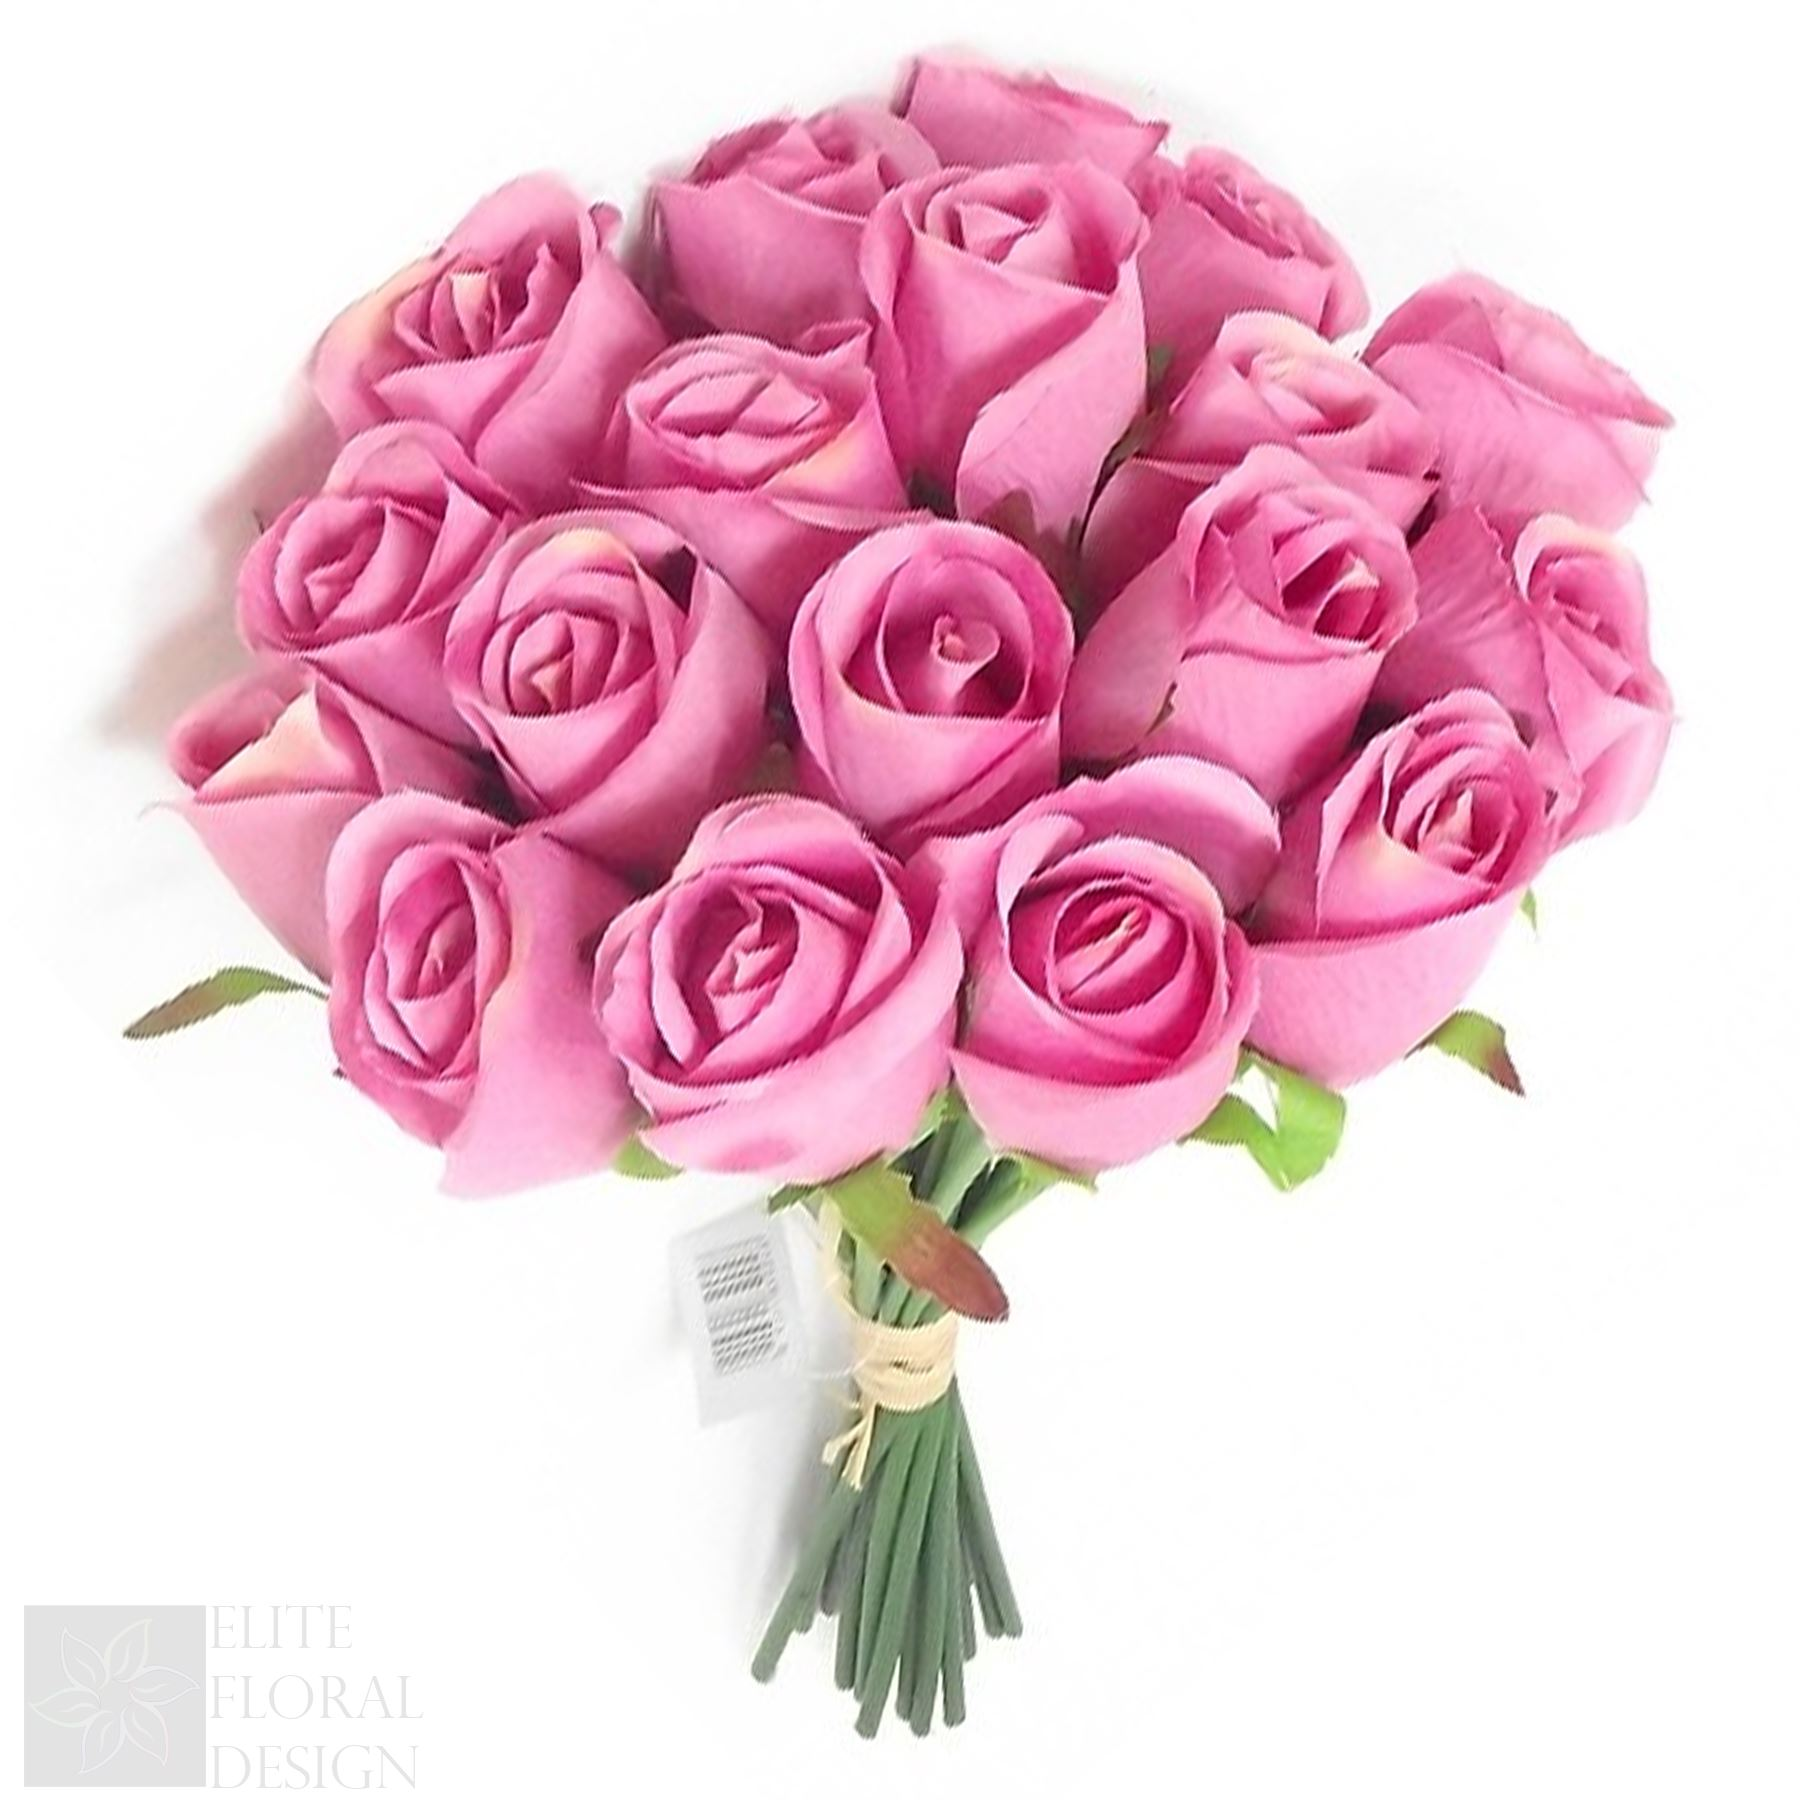 30cm Artificial Silk Roses 18 Heads Wedding Flowers Bridal Bouquets ...